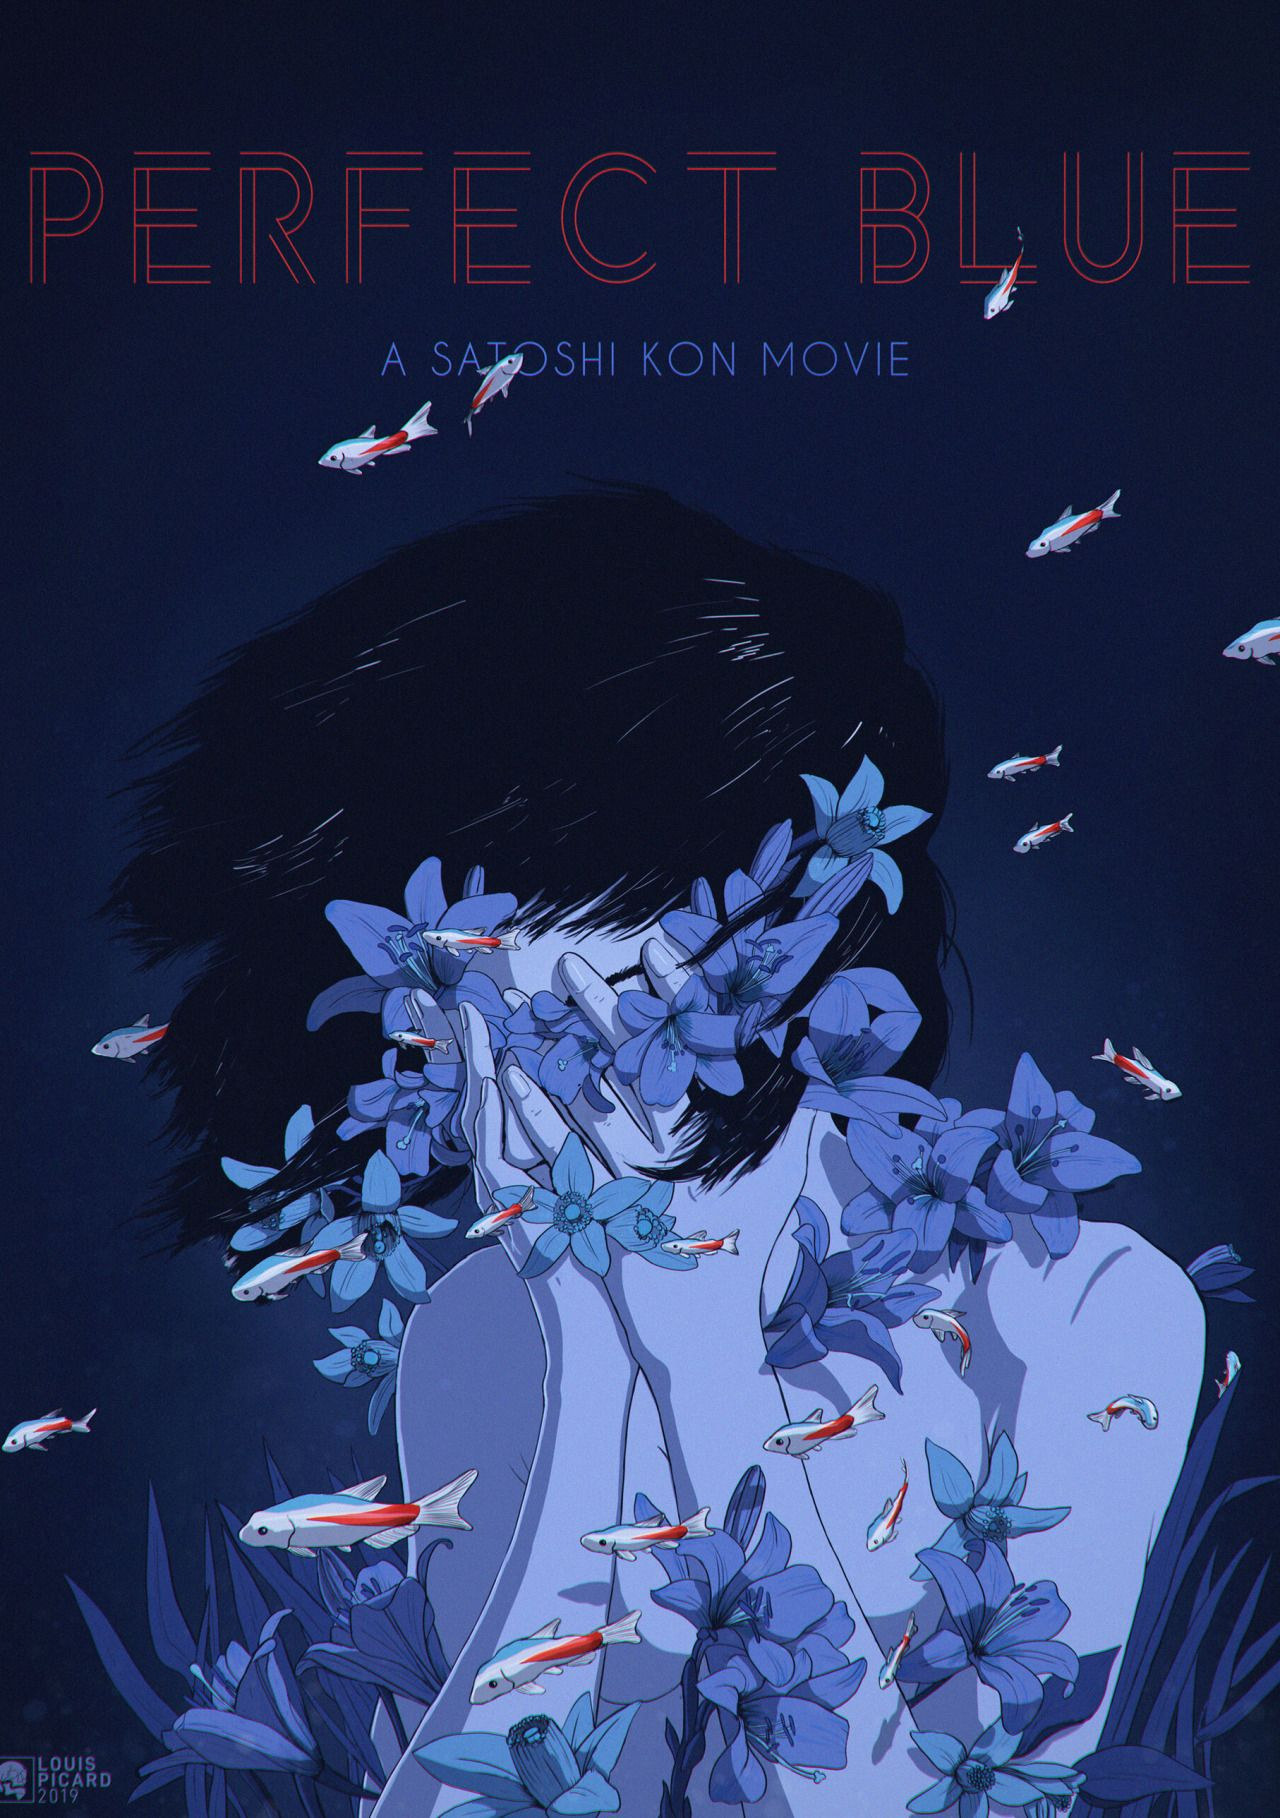 Hook and Ribbon Satoshi kon, Film posters art